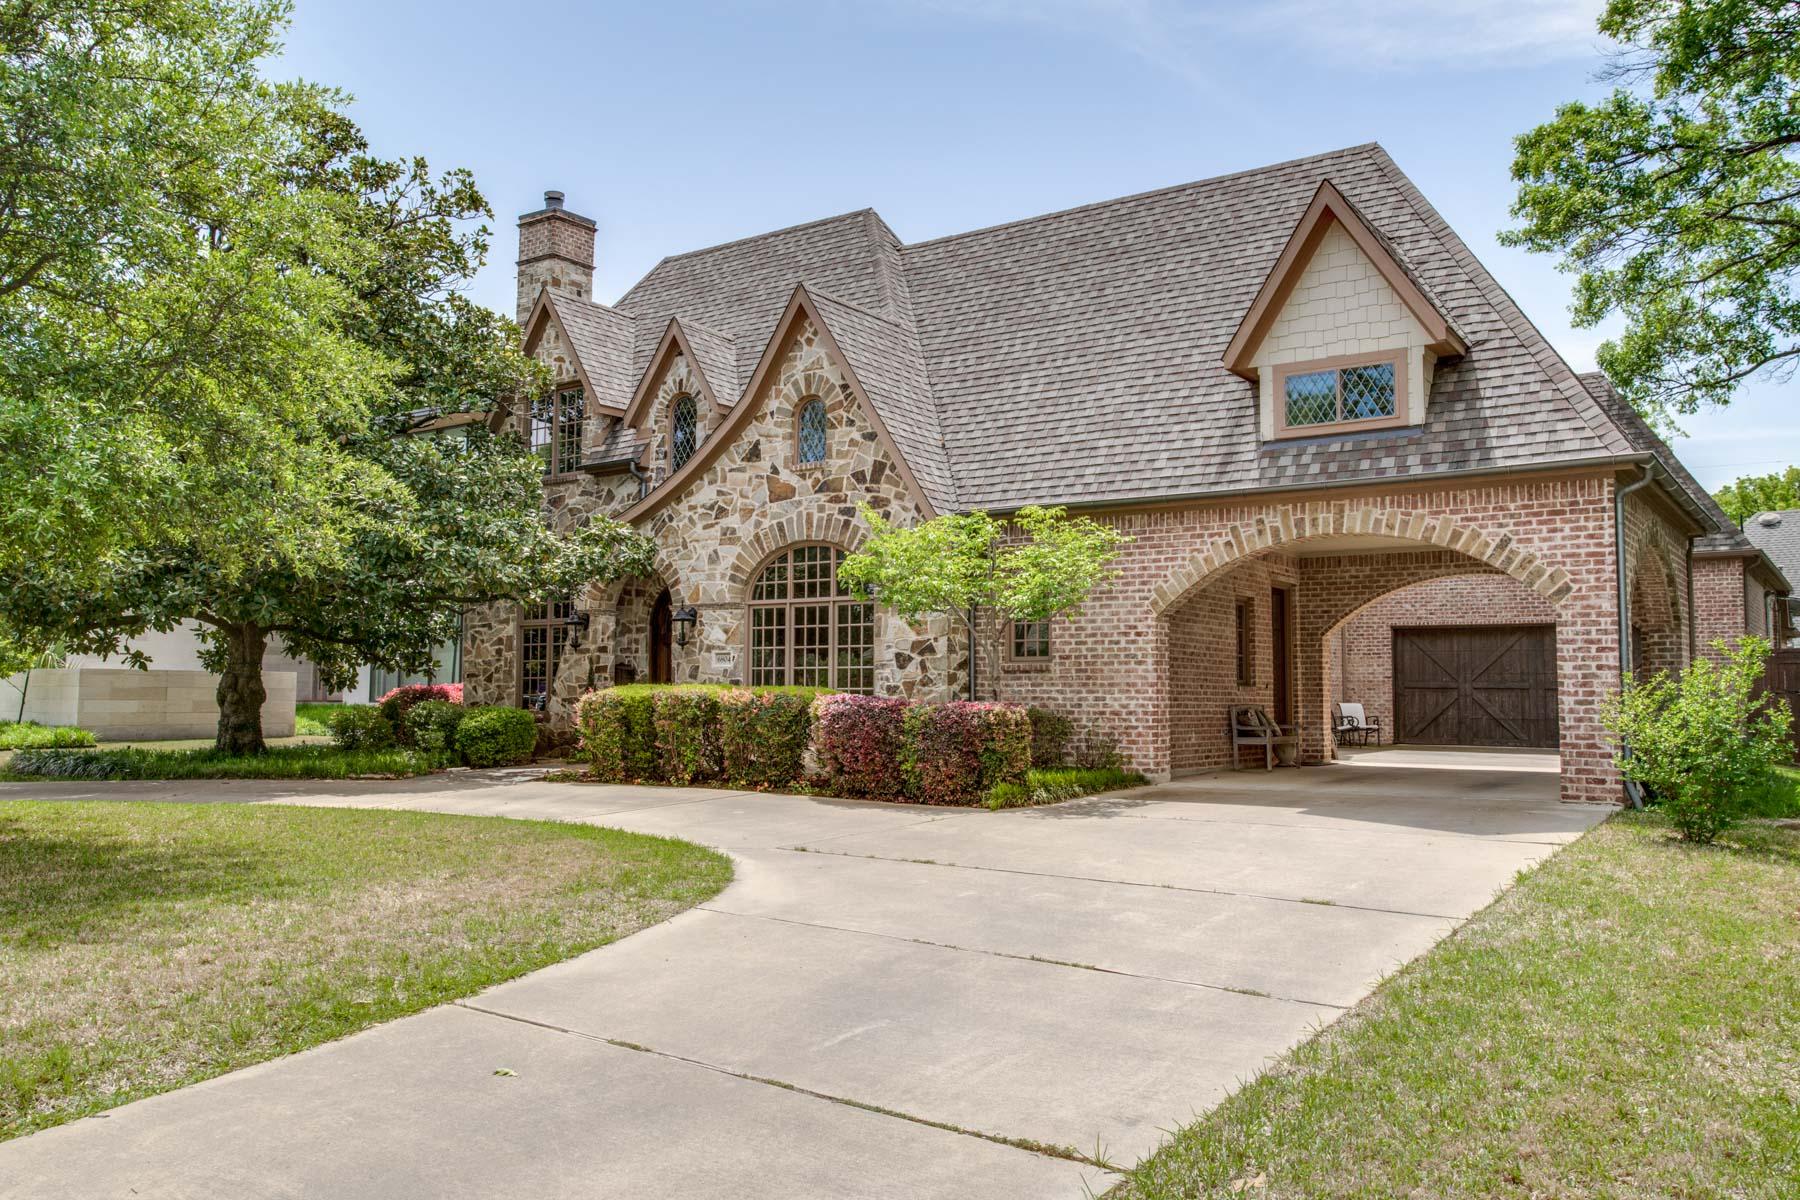 独户住宅 为 销售 在 Preston Hollow Traditional 6804 Chevy Chase Avenue, 达拉斯, 得克萨斯州, 75225 美国